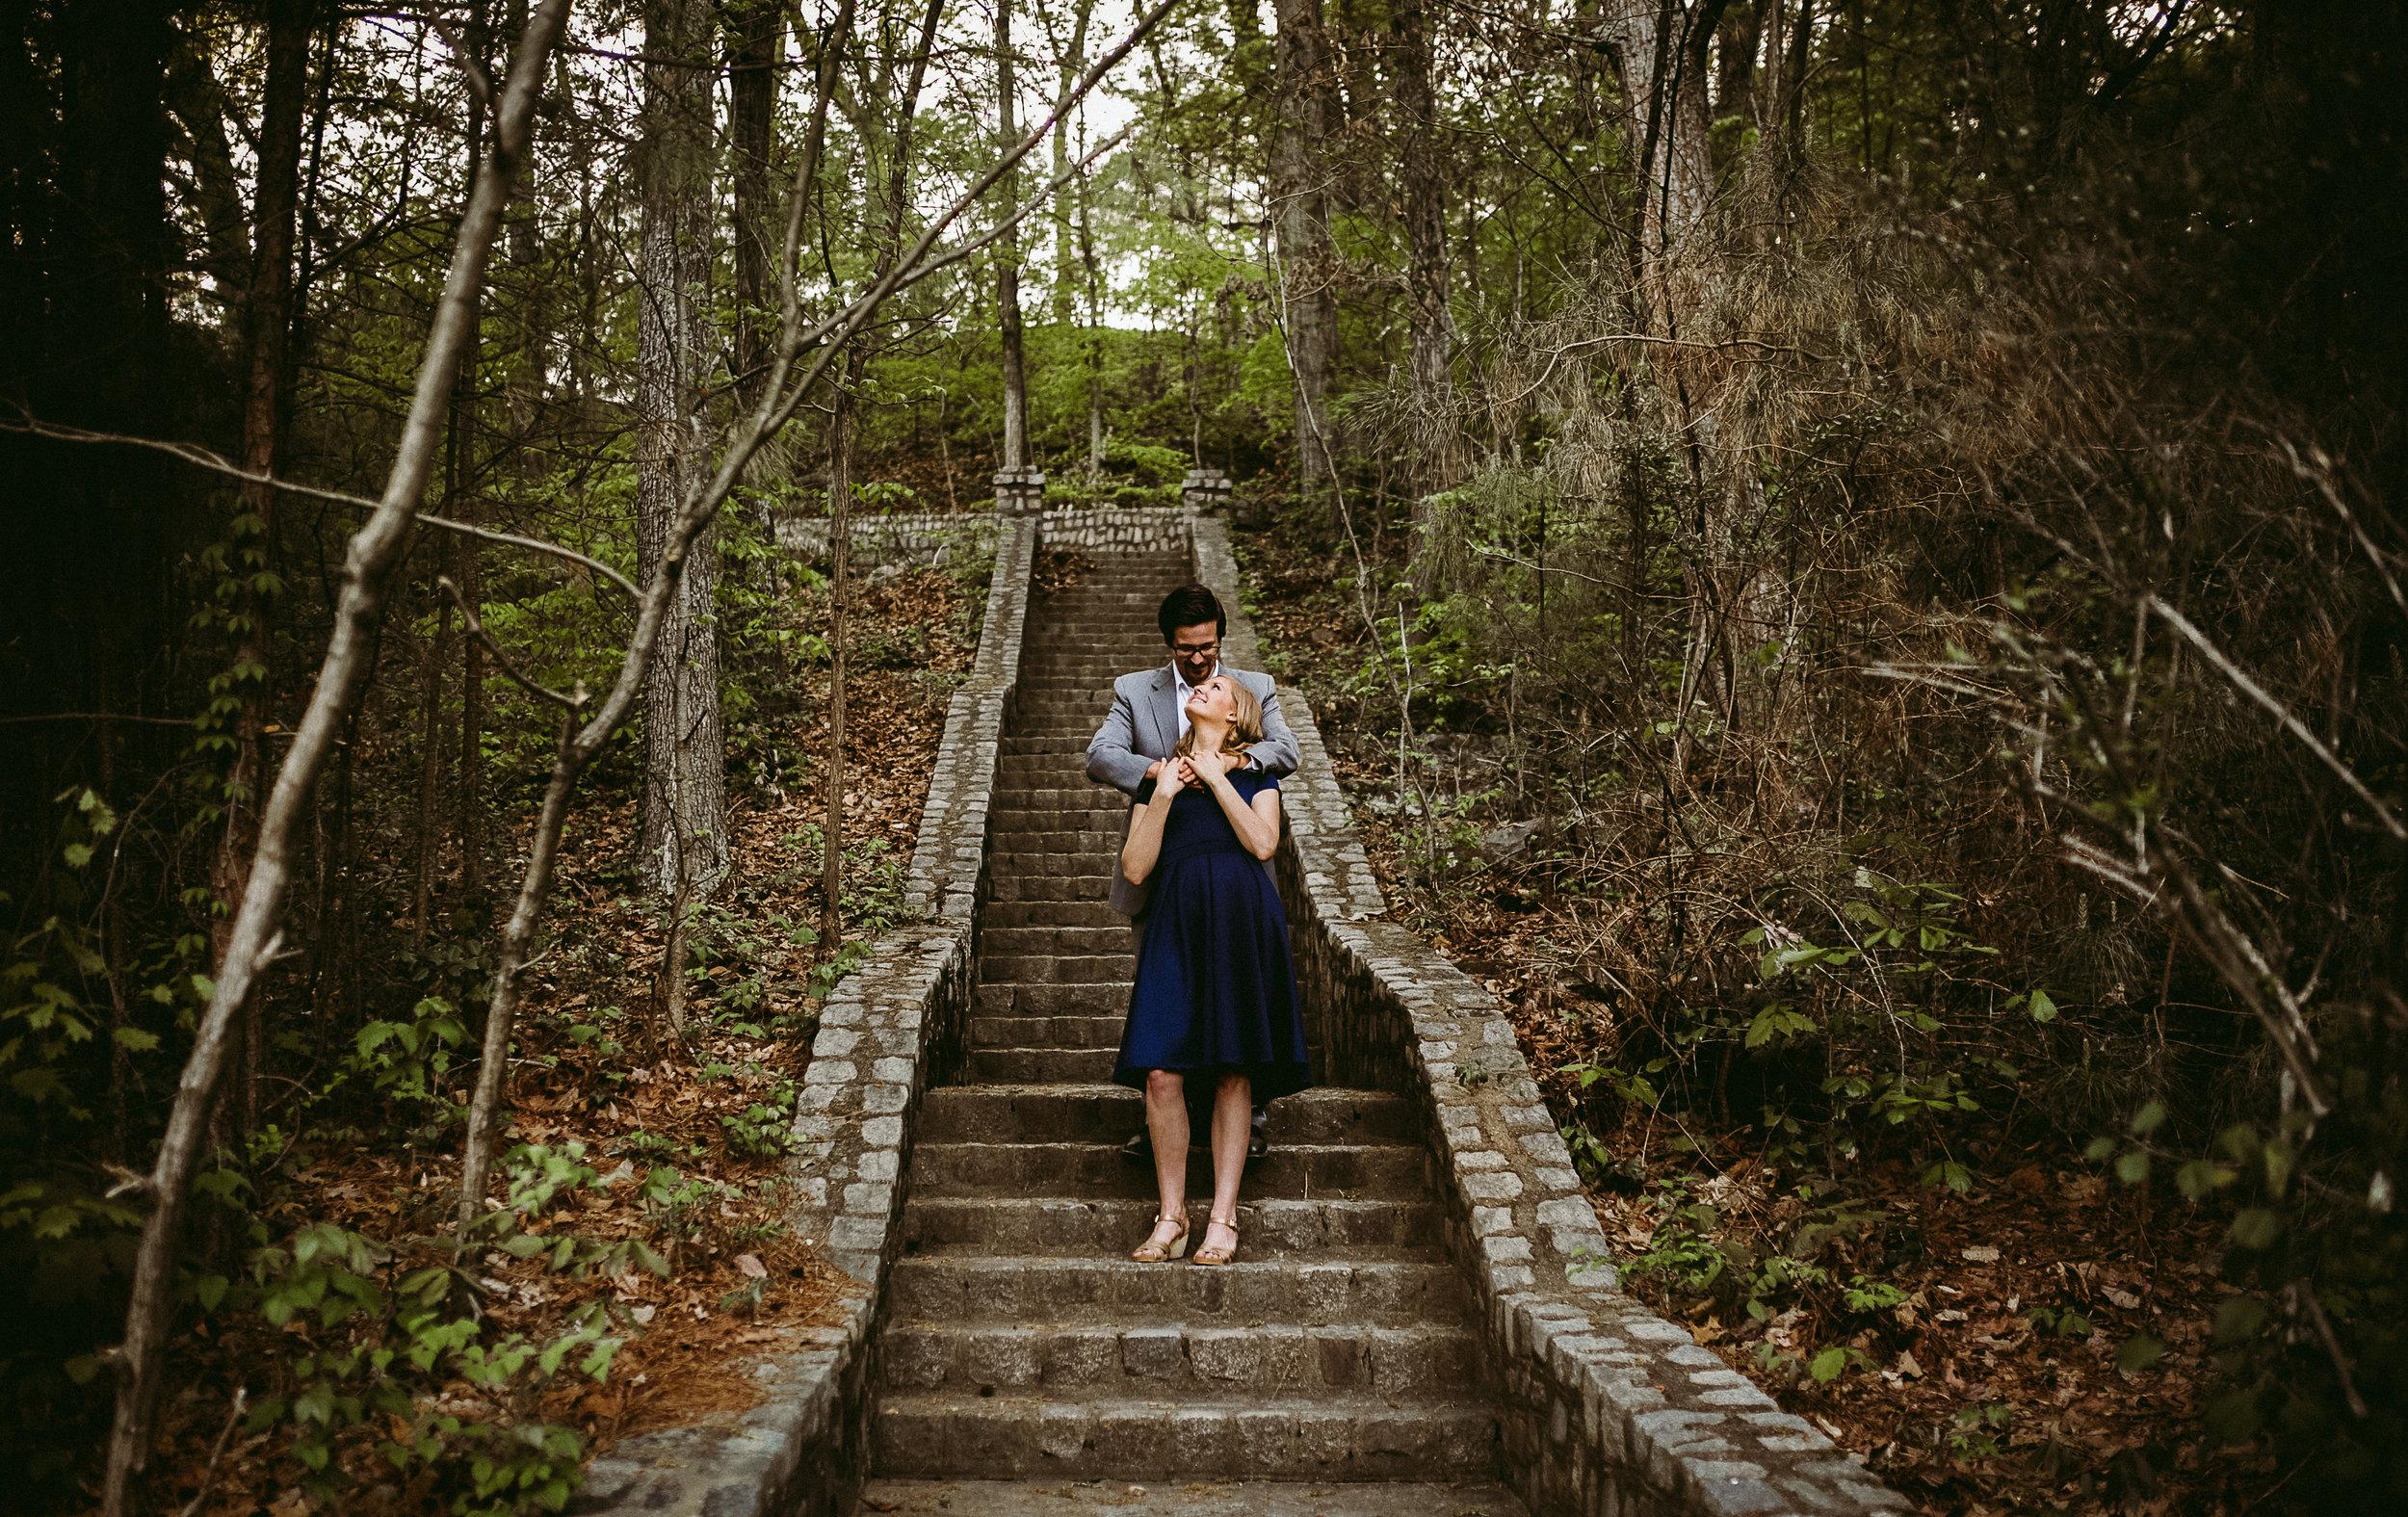 Stephanieandtommyjoe.richmondvirginia.foresthillpark.engagementsession.rebeccaburtphotography-46.jpg